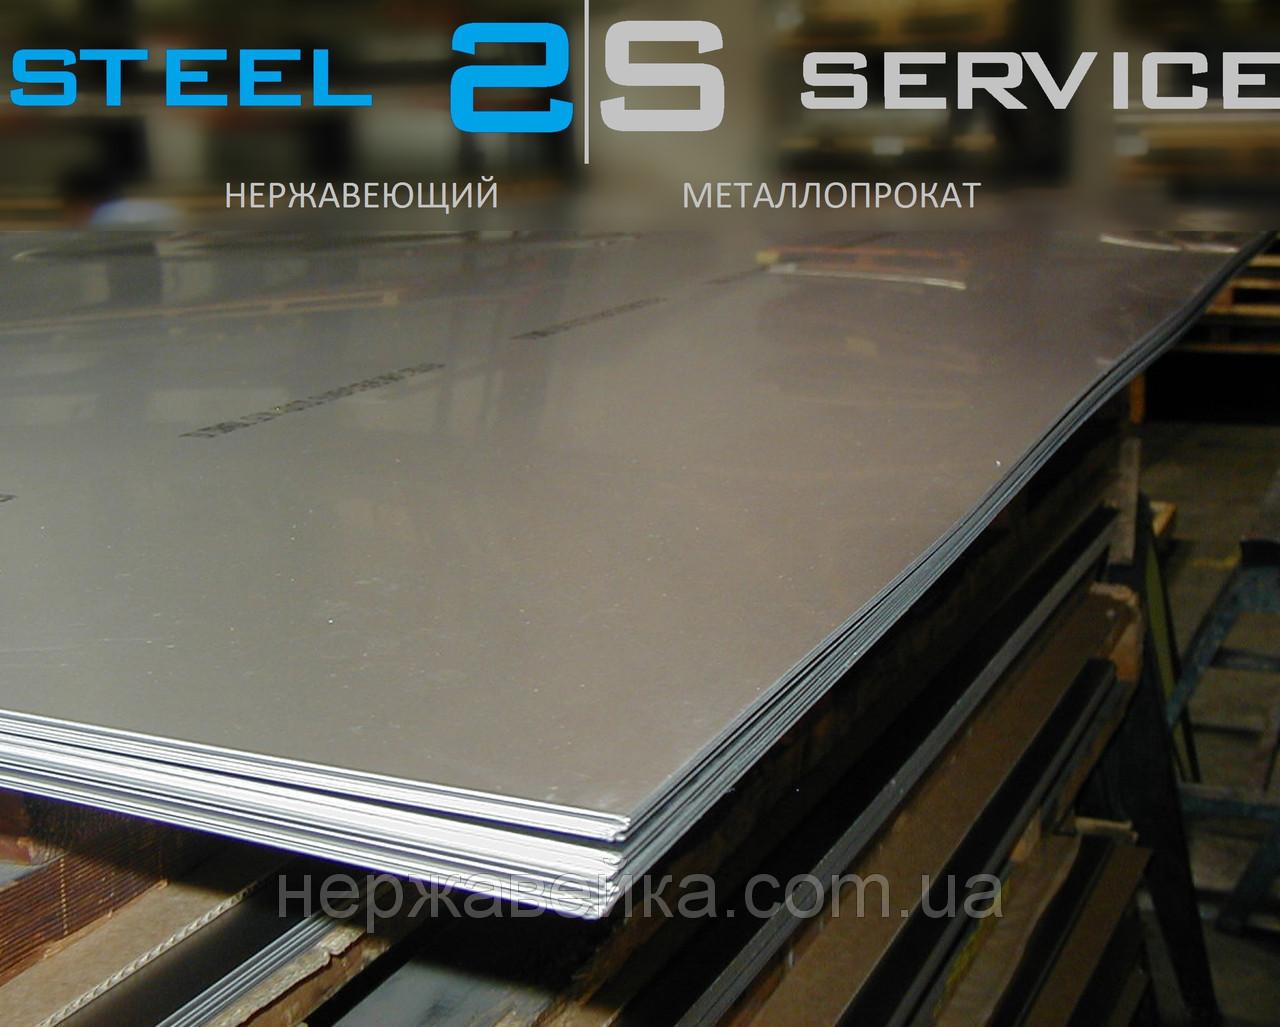 Нержавейка лист 10х1000х2000мм  AISI 316L(03Х17Н14М3) F1 - горячекатанный,  кислотостойкий